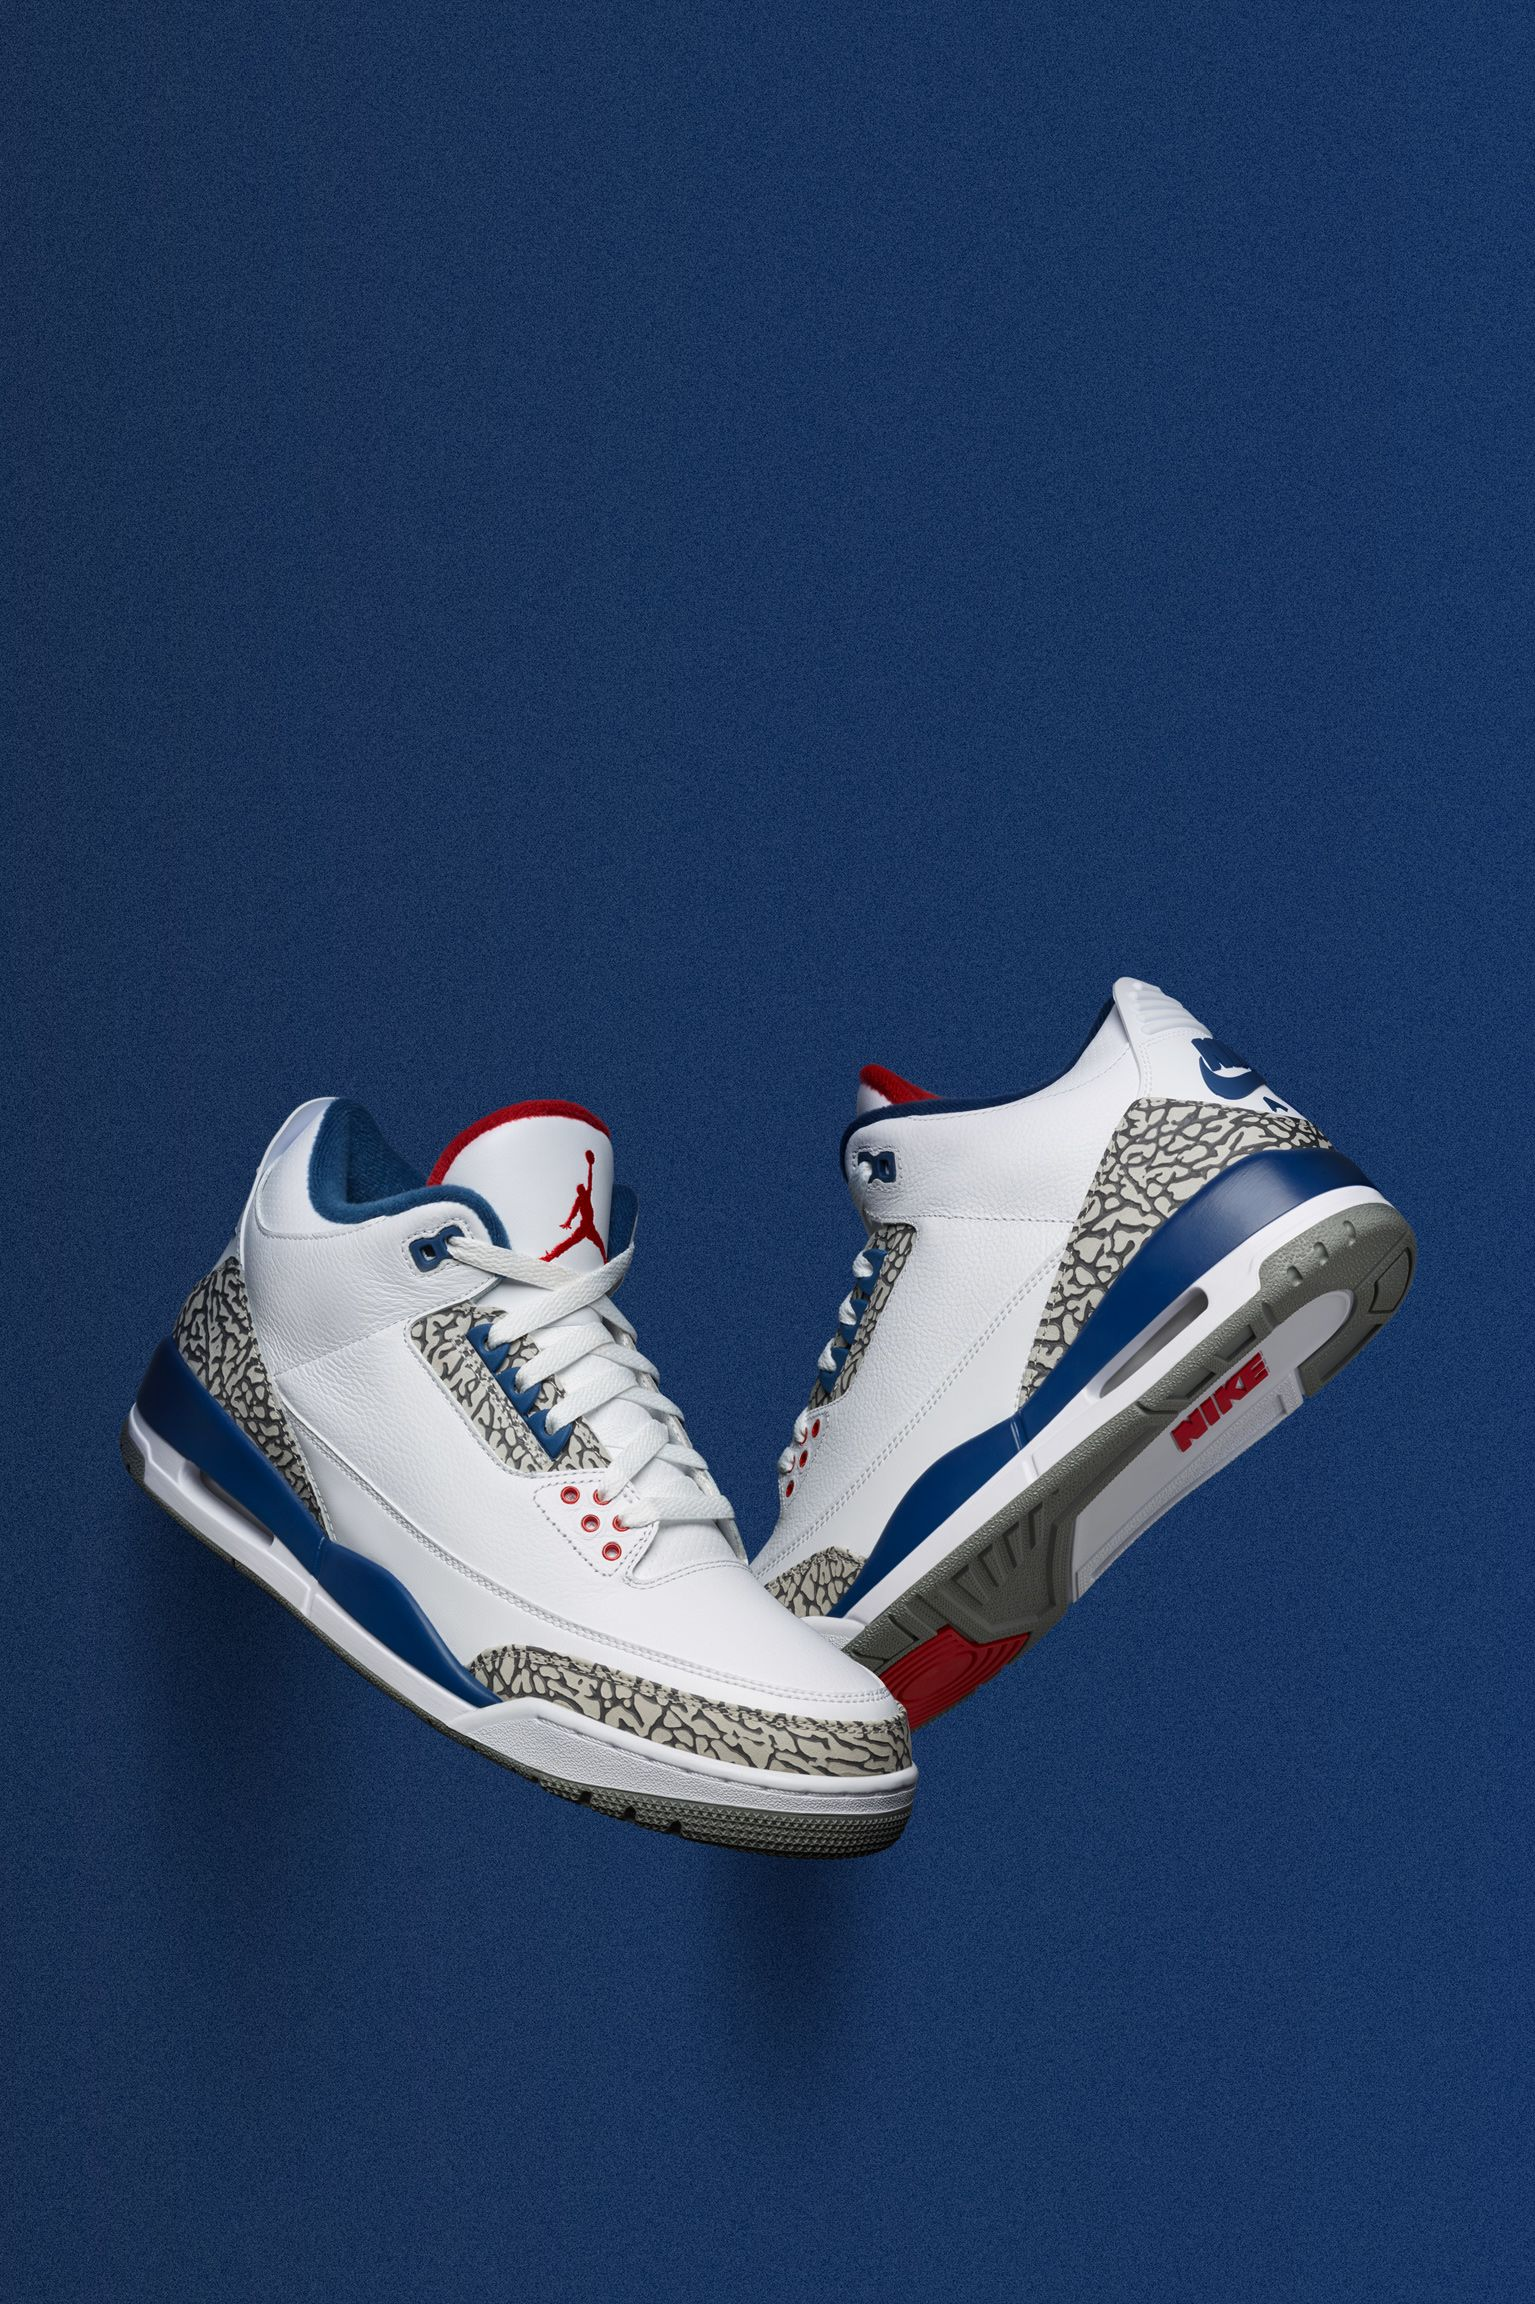 Air Jordan 3 Retro Dark Grey Nike SNKRS